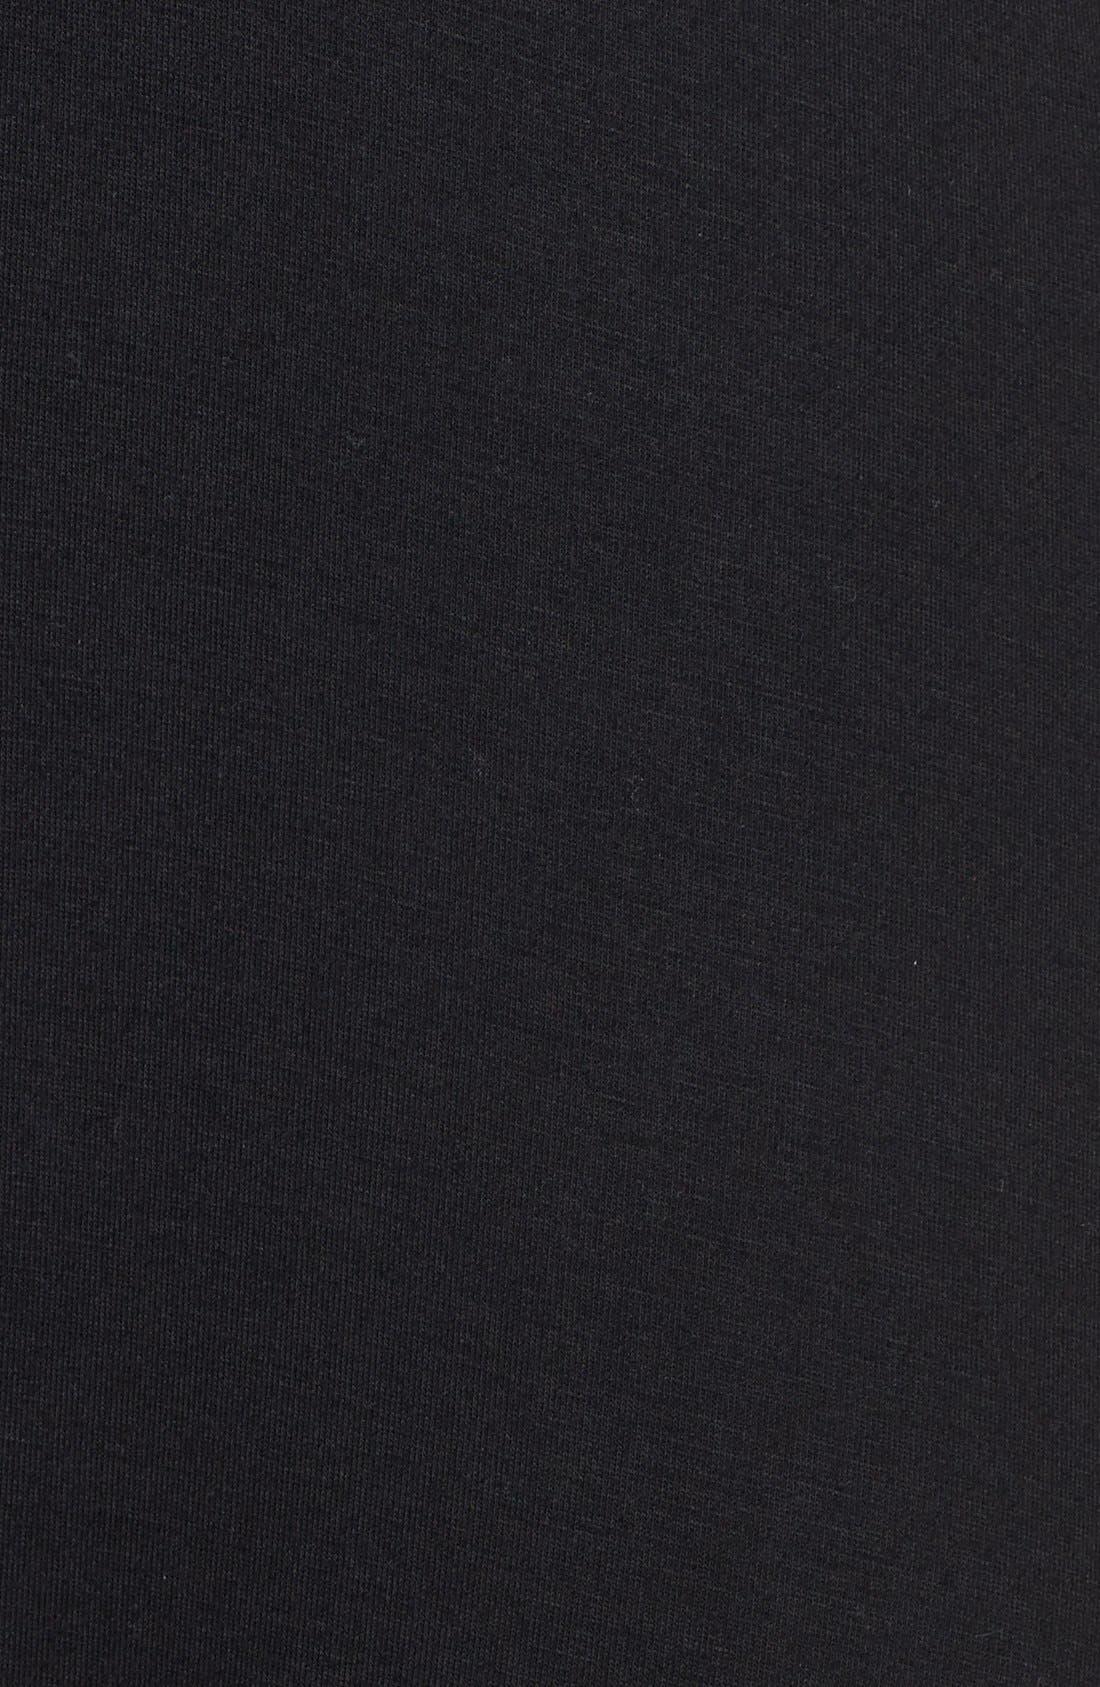 LOVEAPPELLA, Knit Maxi Dress, Alternate thumbnail 9, color, BLACK